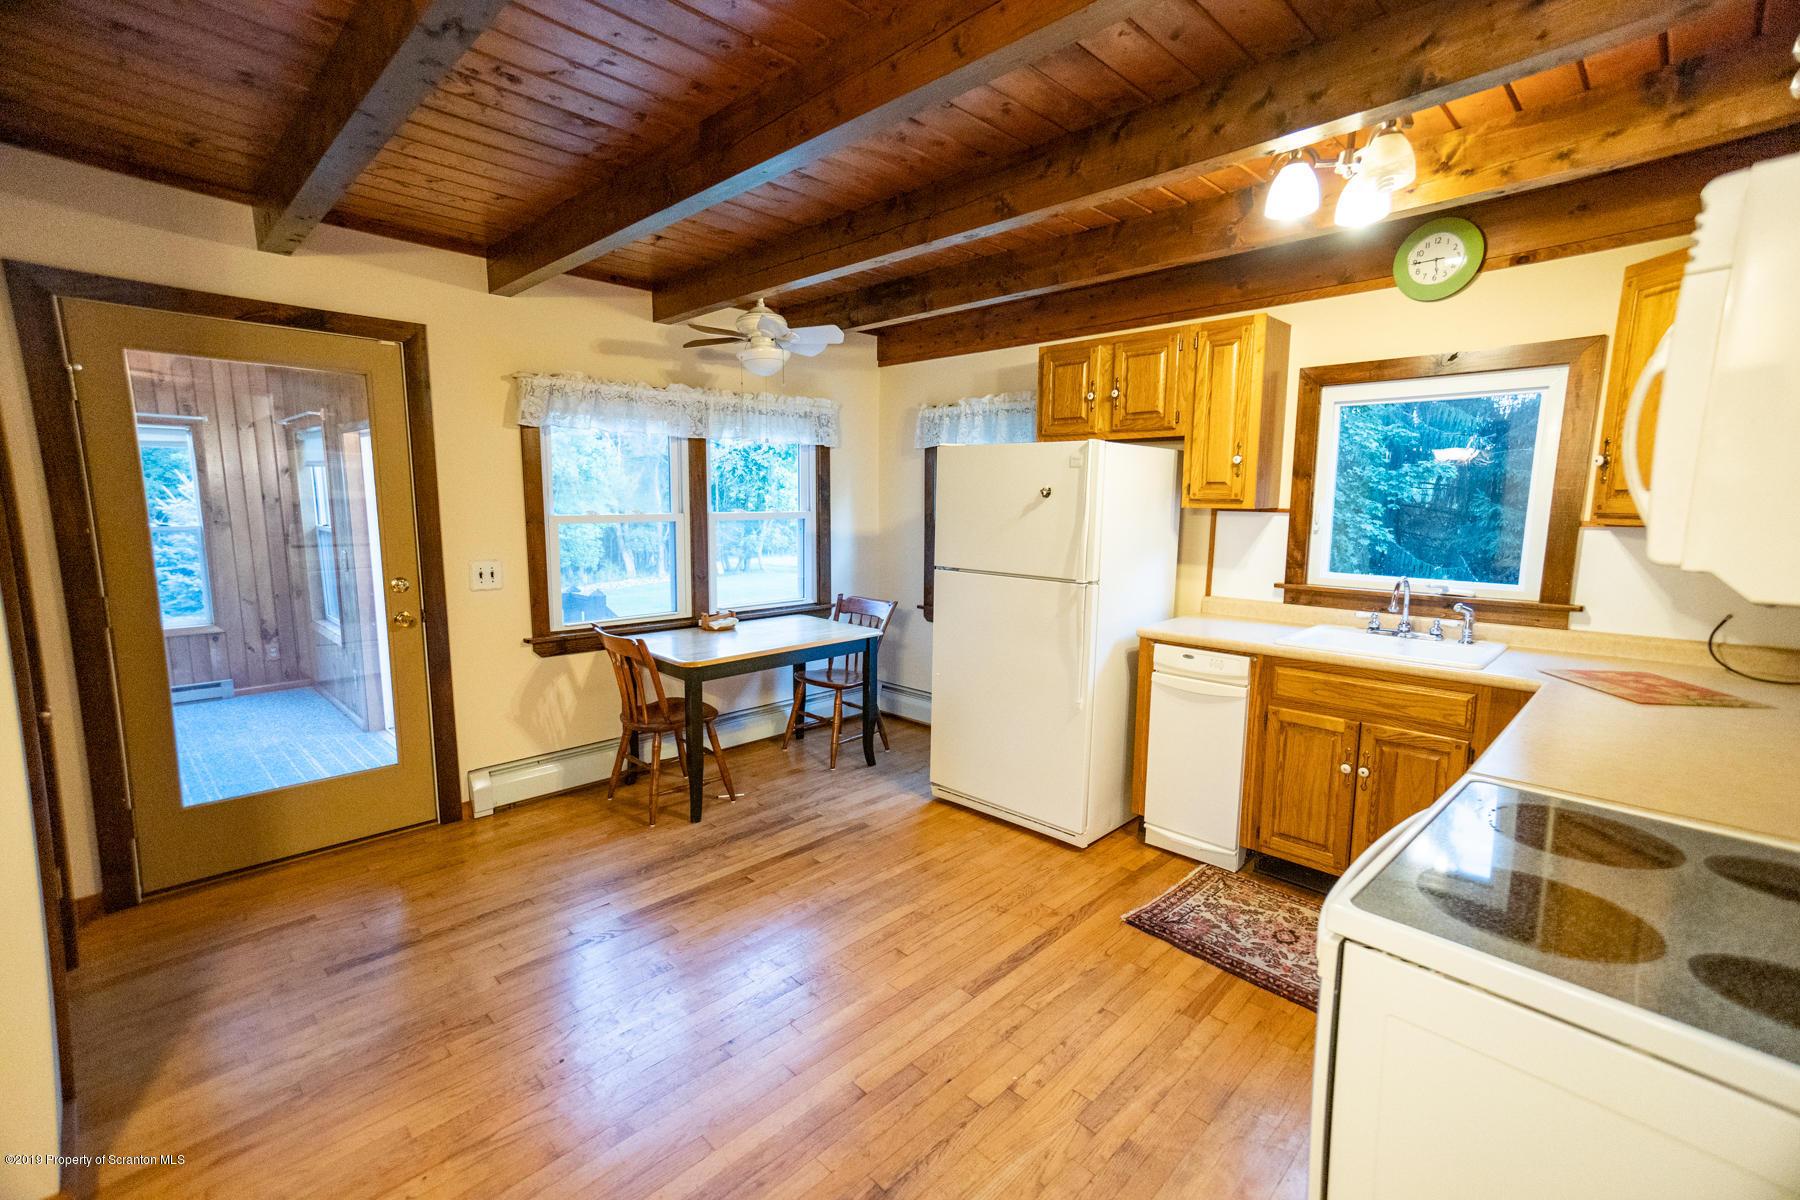 2590 Potter Hill Road, Thompson, Pennsylvania 18465, 2 Bedrooms Bedrooms, 5 Rooms Rooms,2 BathroomsBathrooms,Single Family,For Sale,Potter Hill Road,19-4171